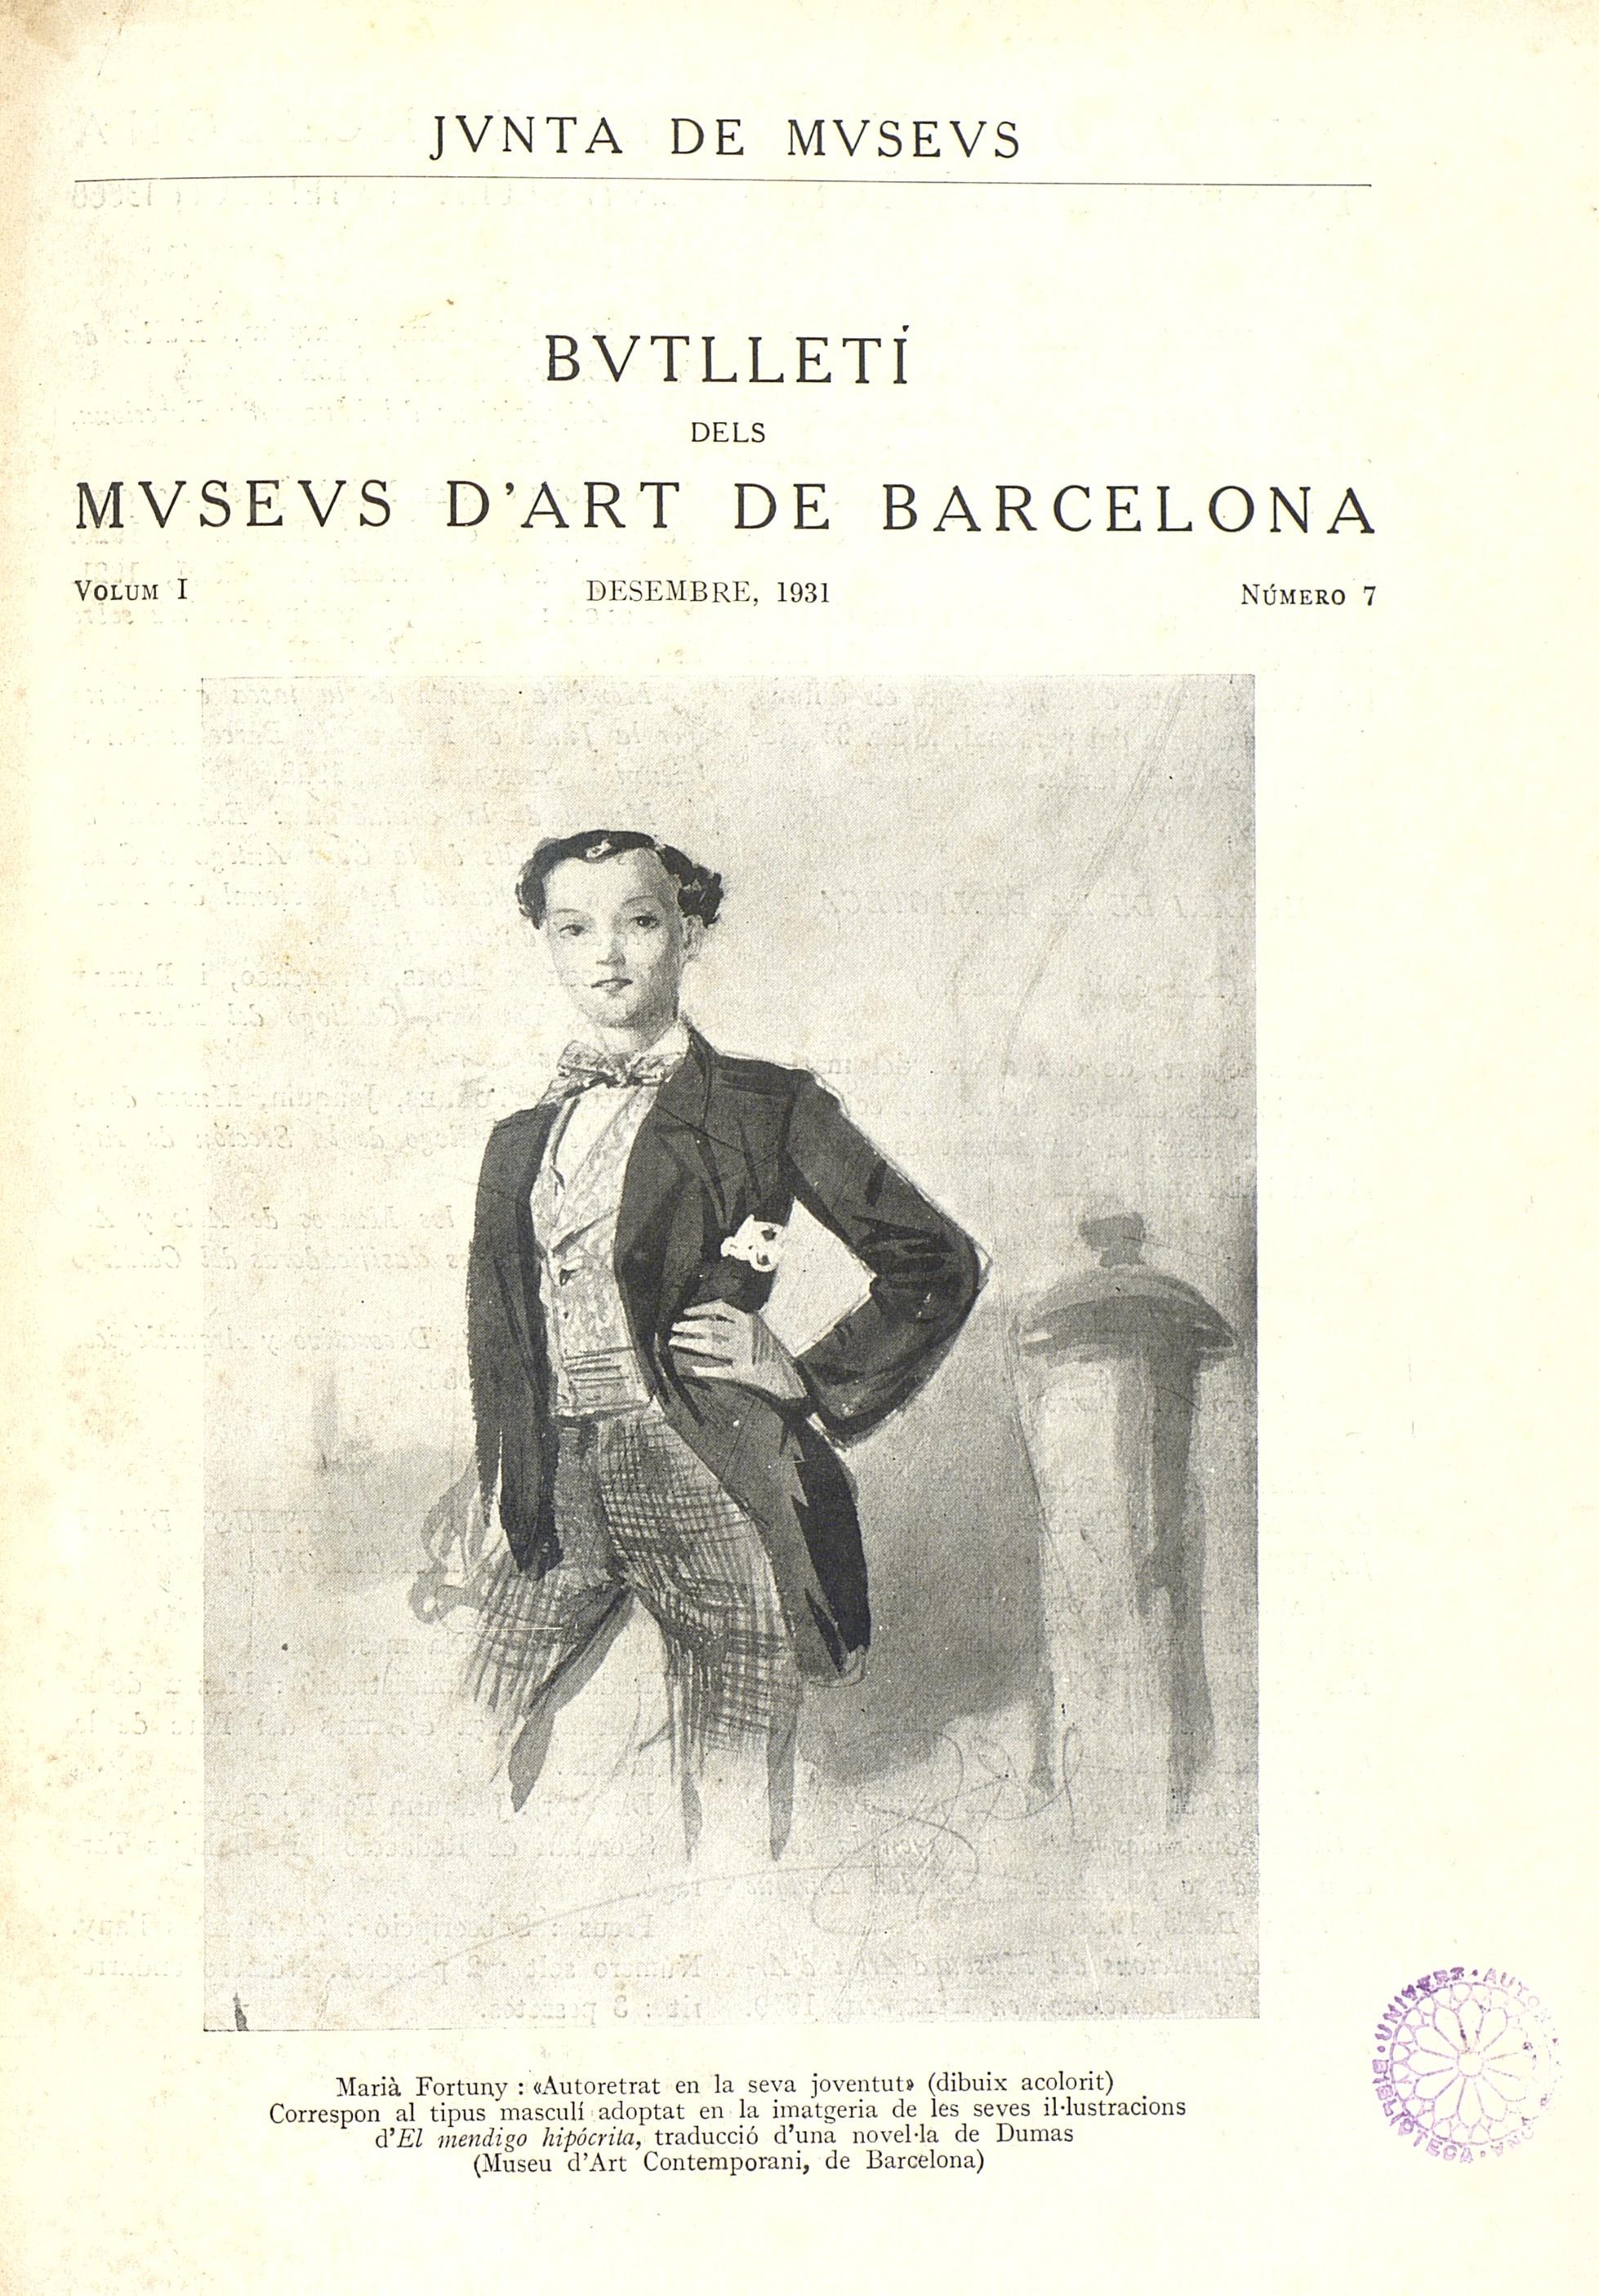 Vol. 1, núm. 7 (desembre 1931)